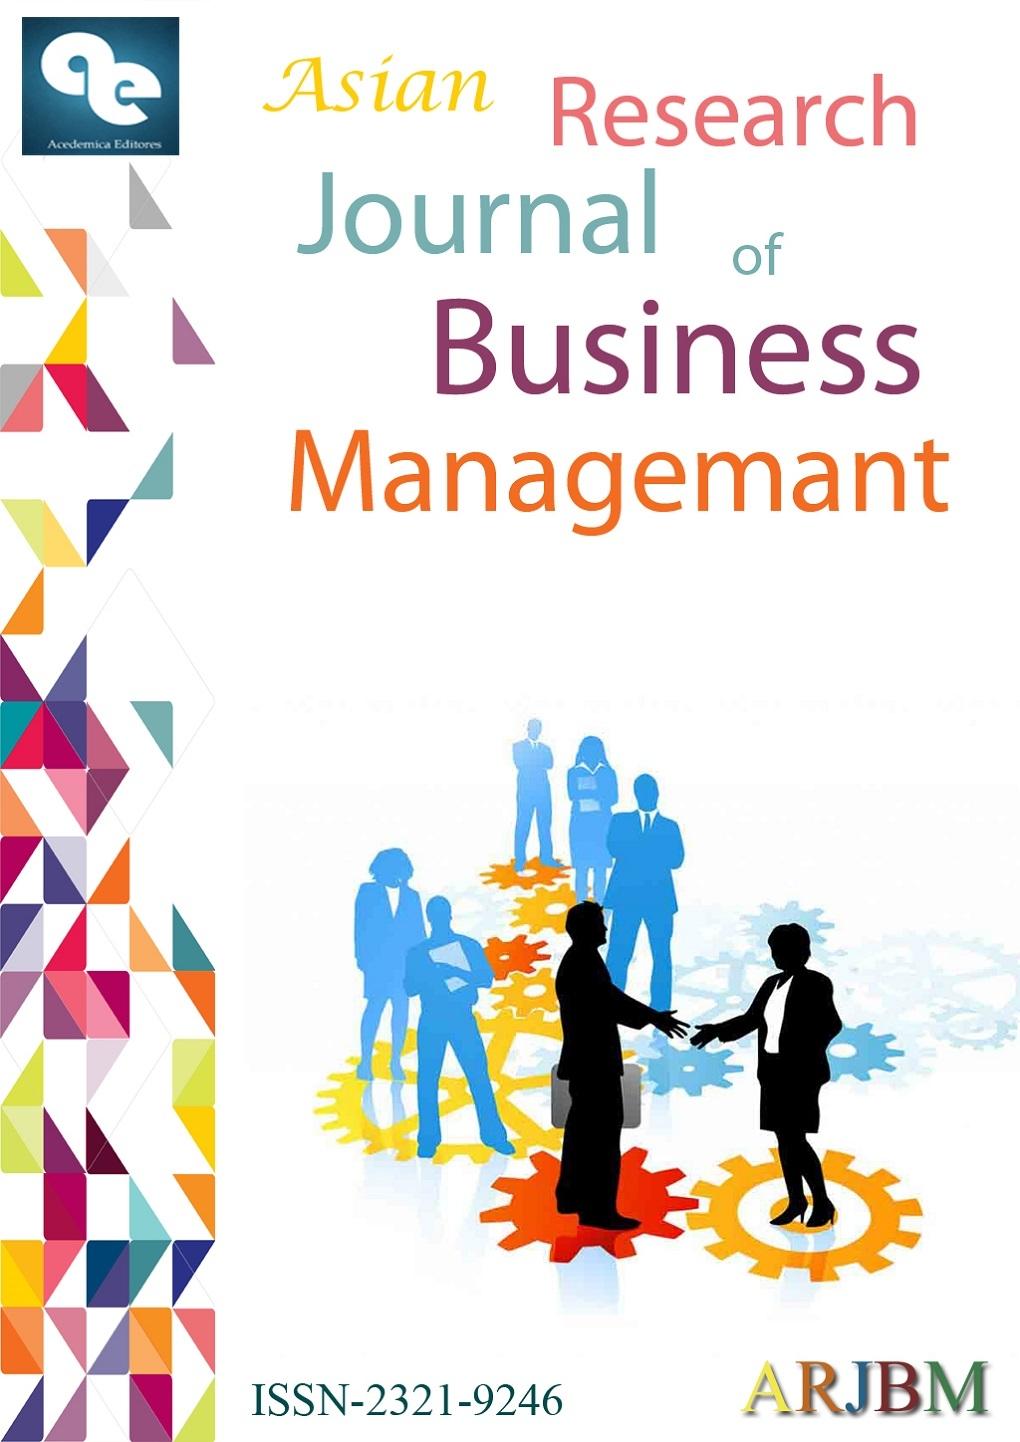 Journal: Asian Research Journal of Business Management